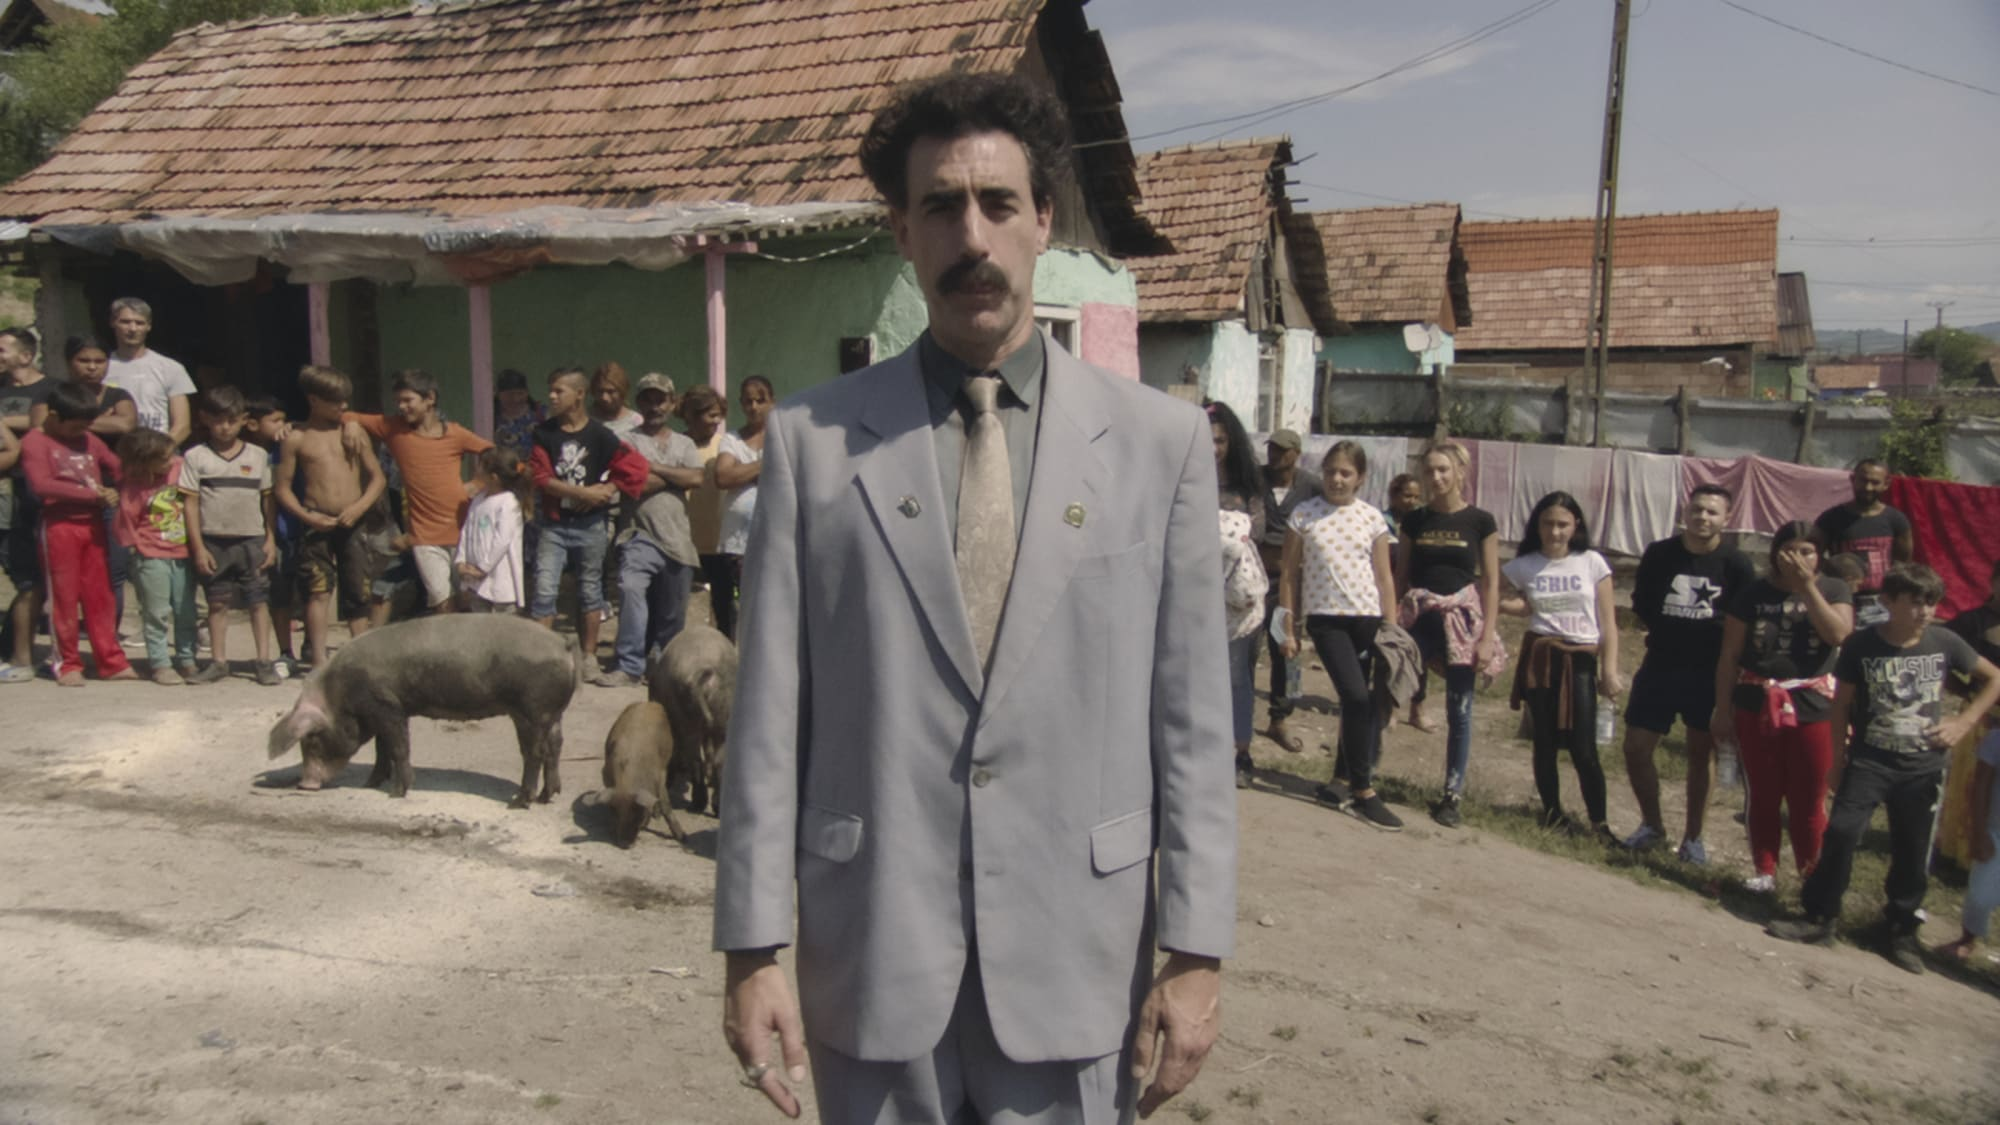 Online watch youtube borat [WATCH] Borat